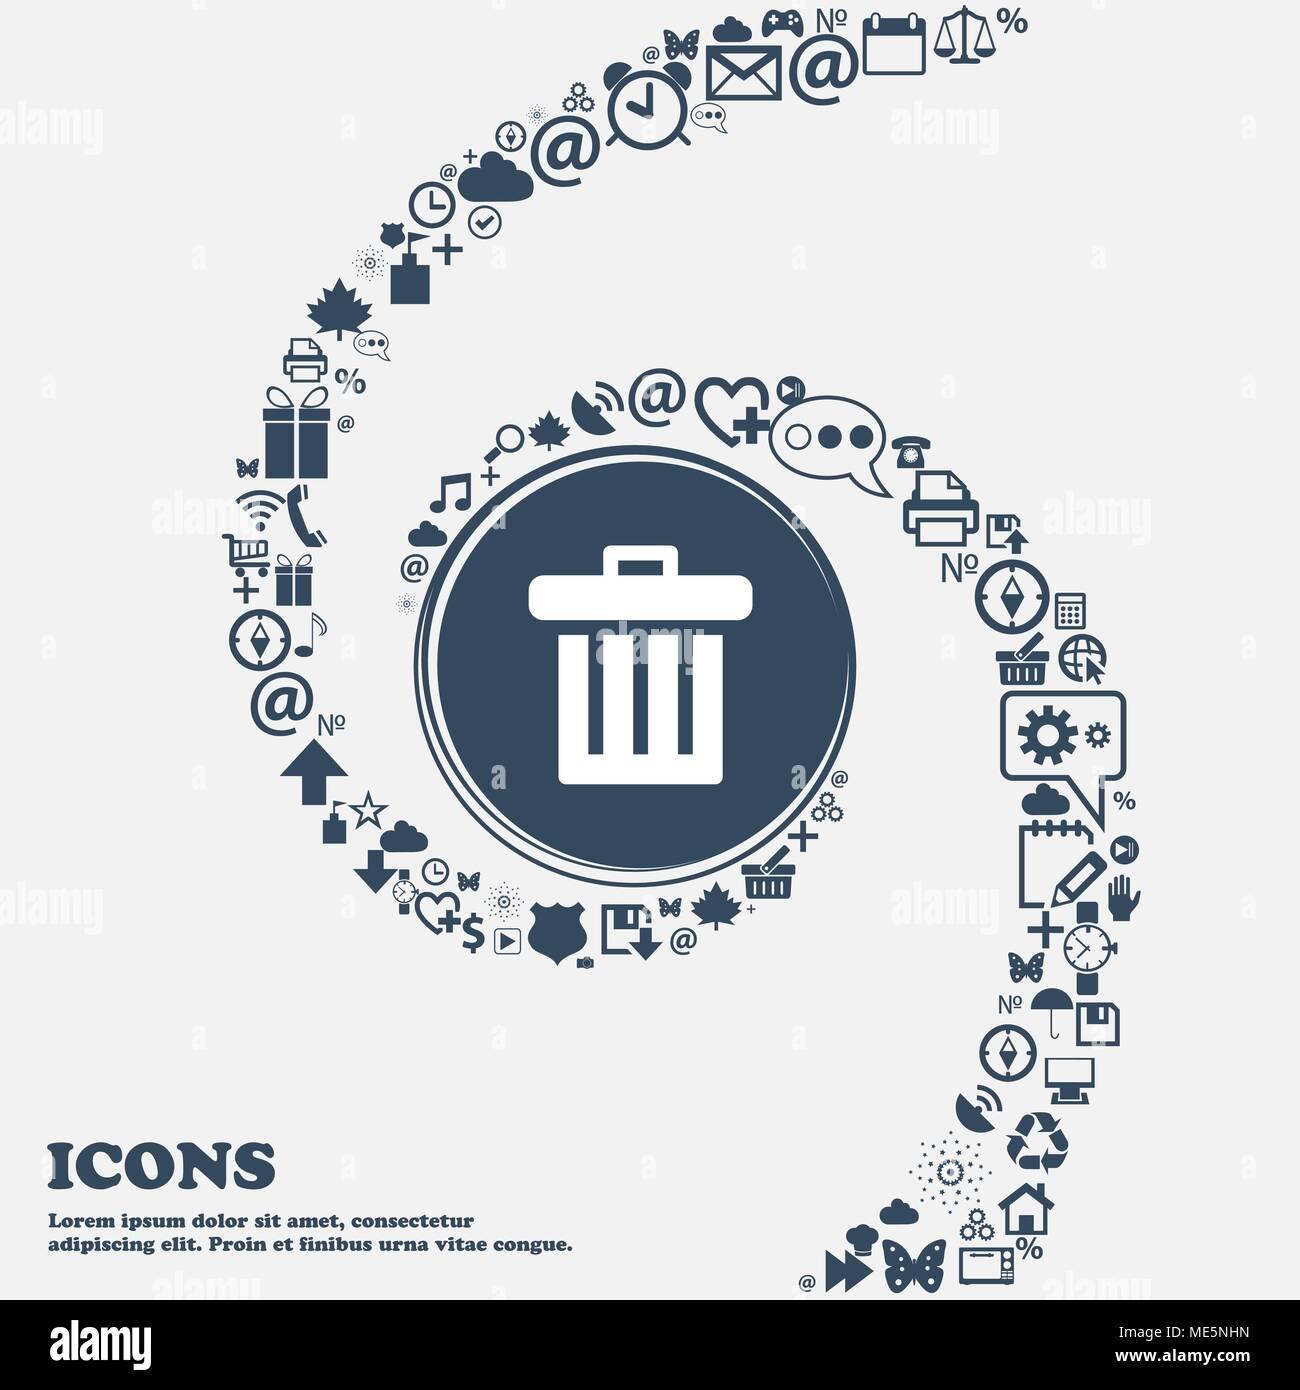 Plastic Recycling Symbols Stock Photos Plastic Recycling Symbols